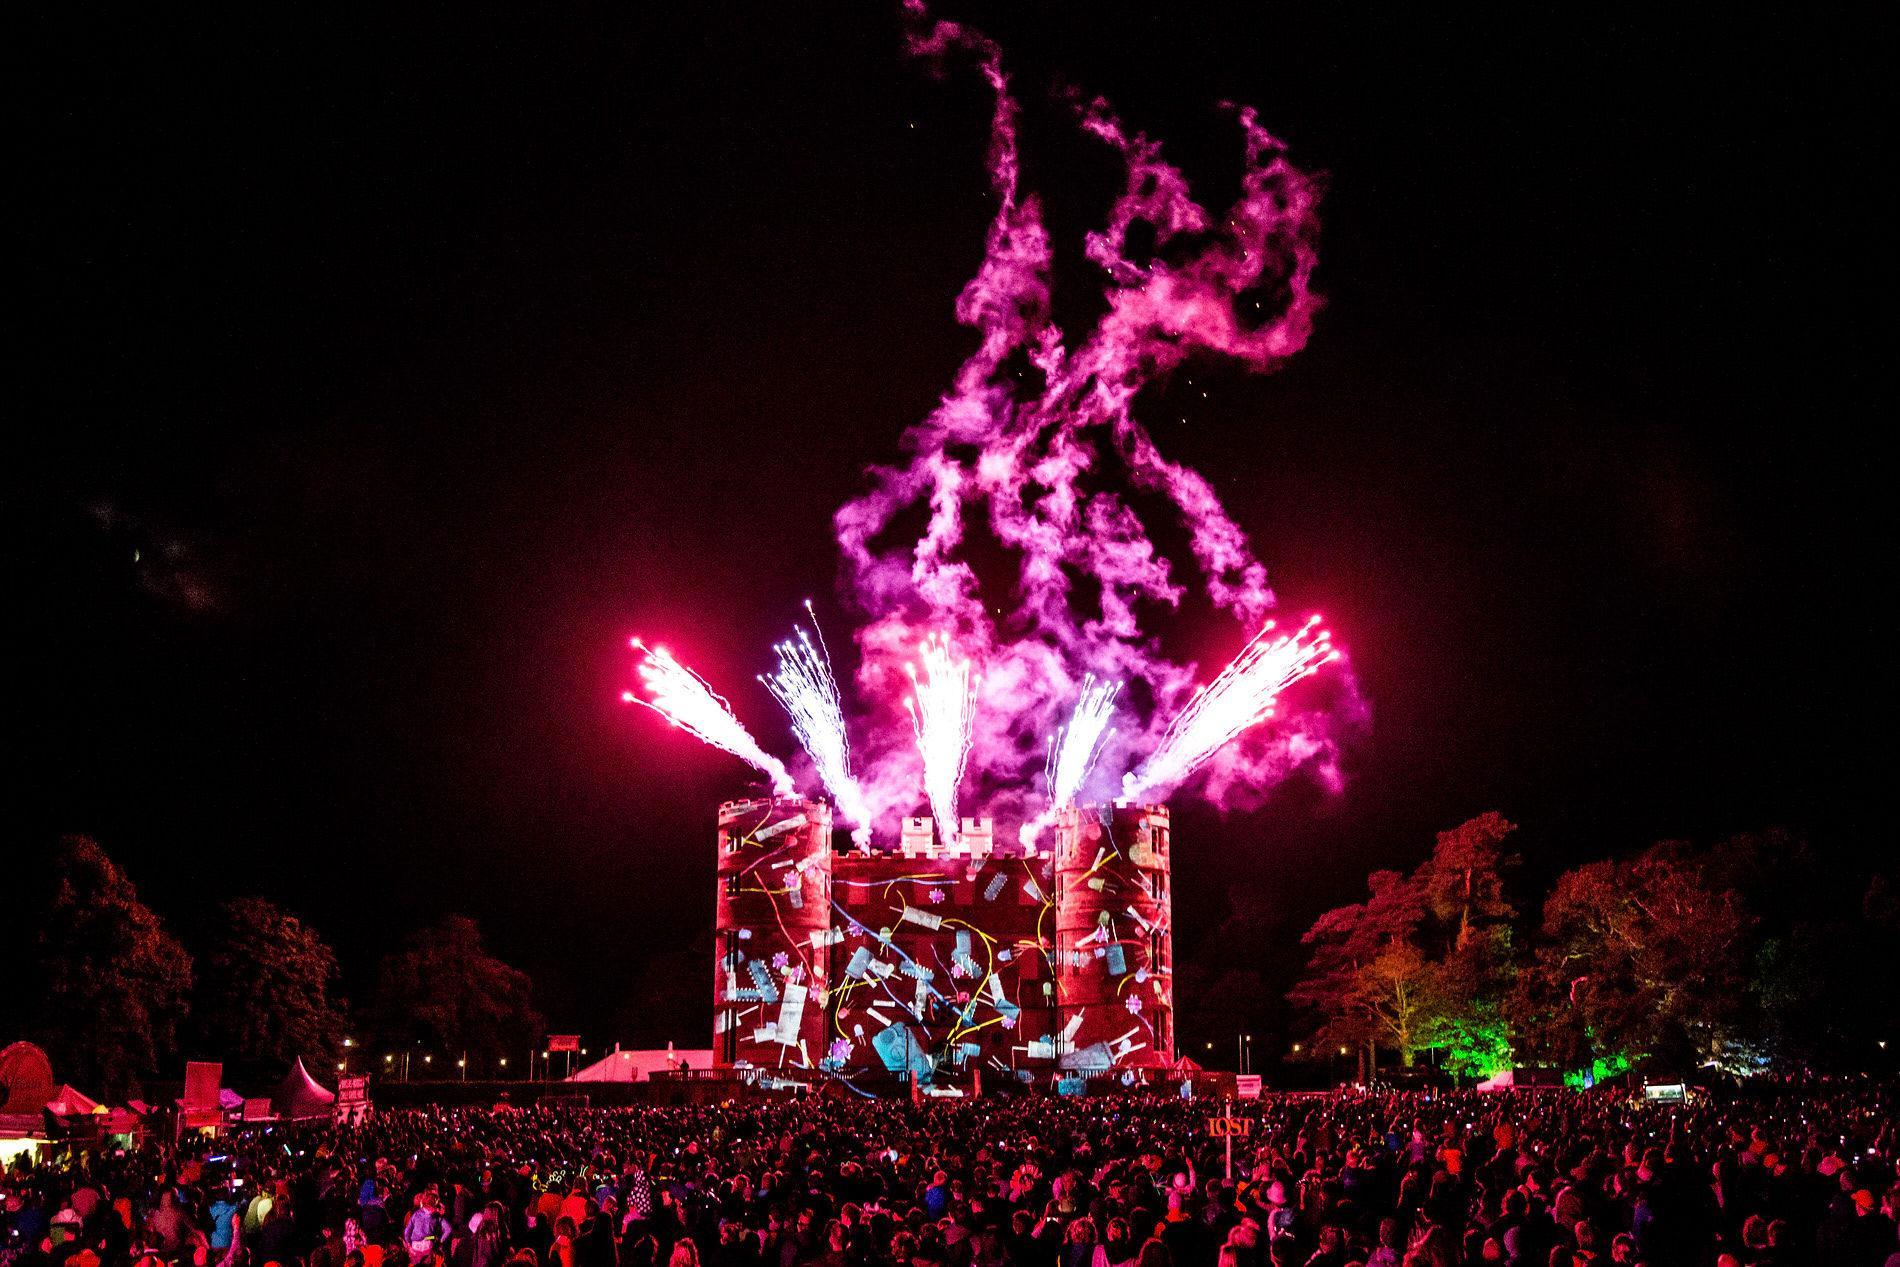 152-CampBestival2017-Fireworks-RB-F61A2789.jpg